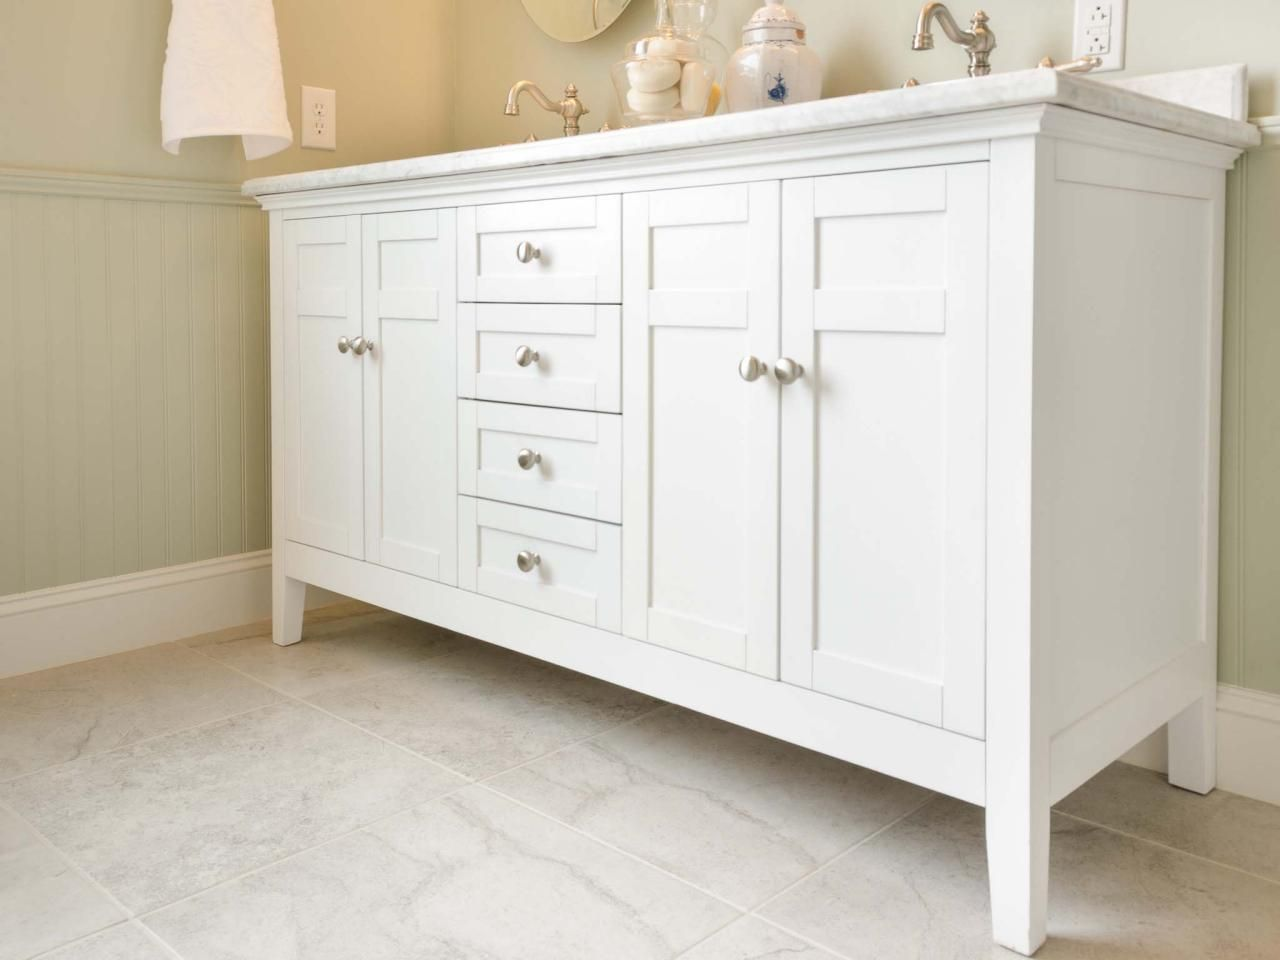 Guide To Selecting Bathroom Cabinets Bathroom Vanity Designs Bathroom Cabinets Diy Bathroom Cabinets